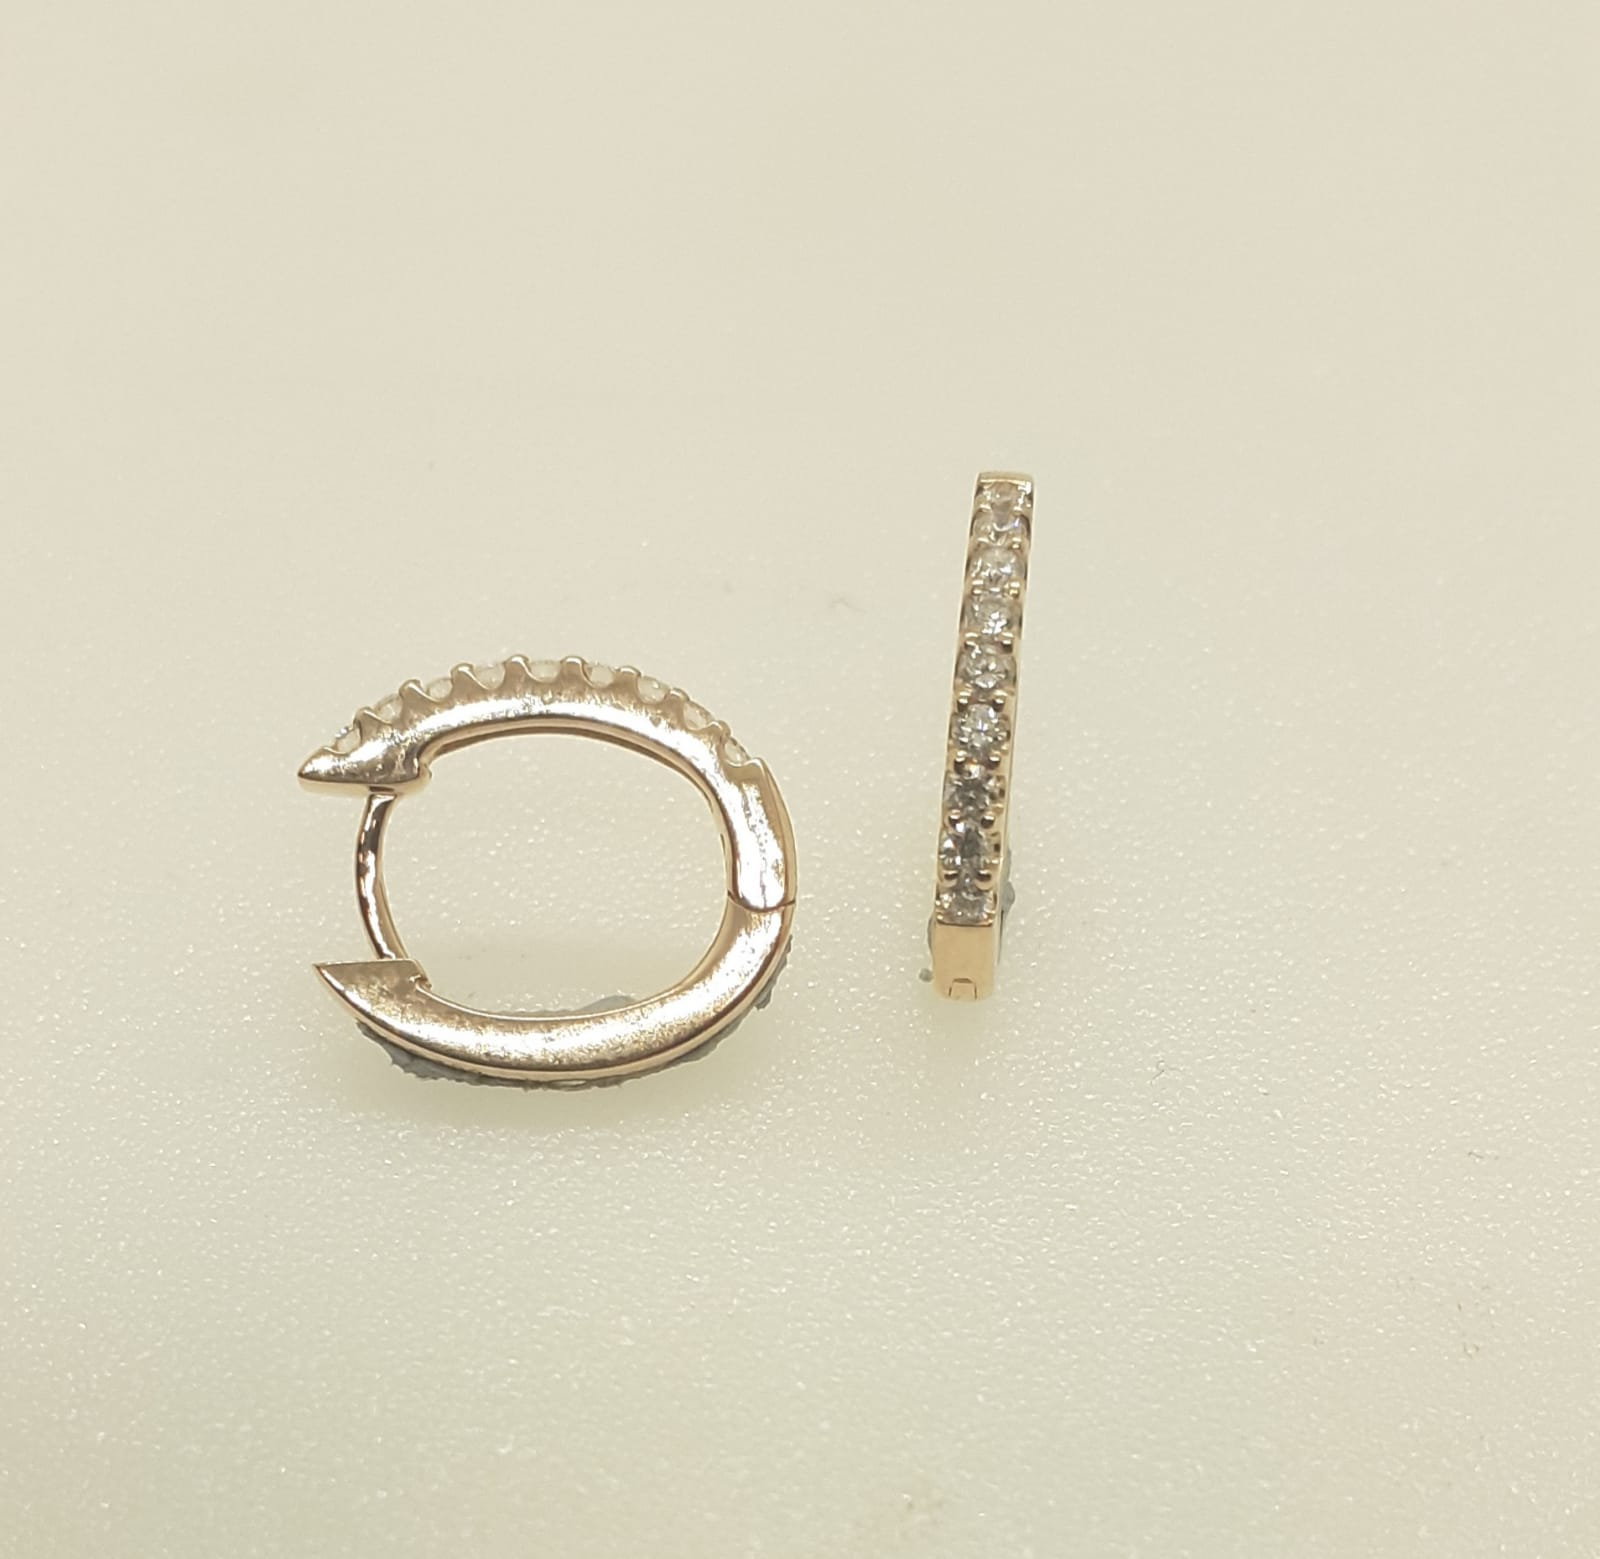 Sensi joyas jewellery Granada silver engagementDIAMONDS EARRINGS ROSE